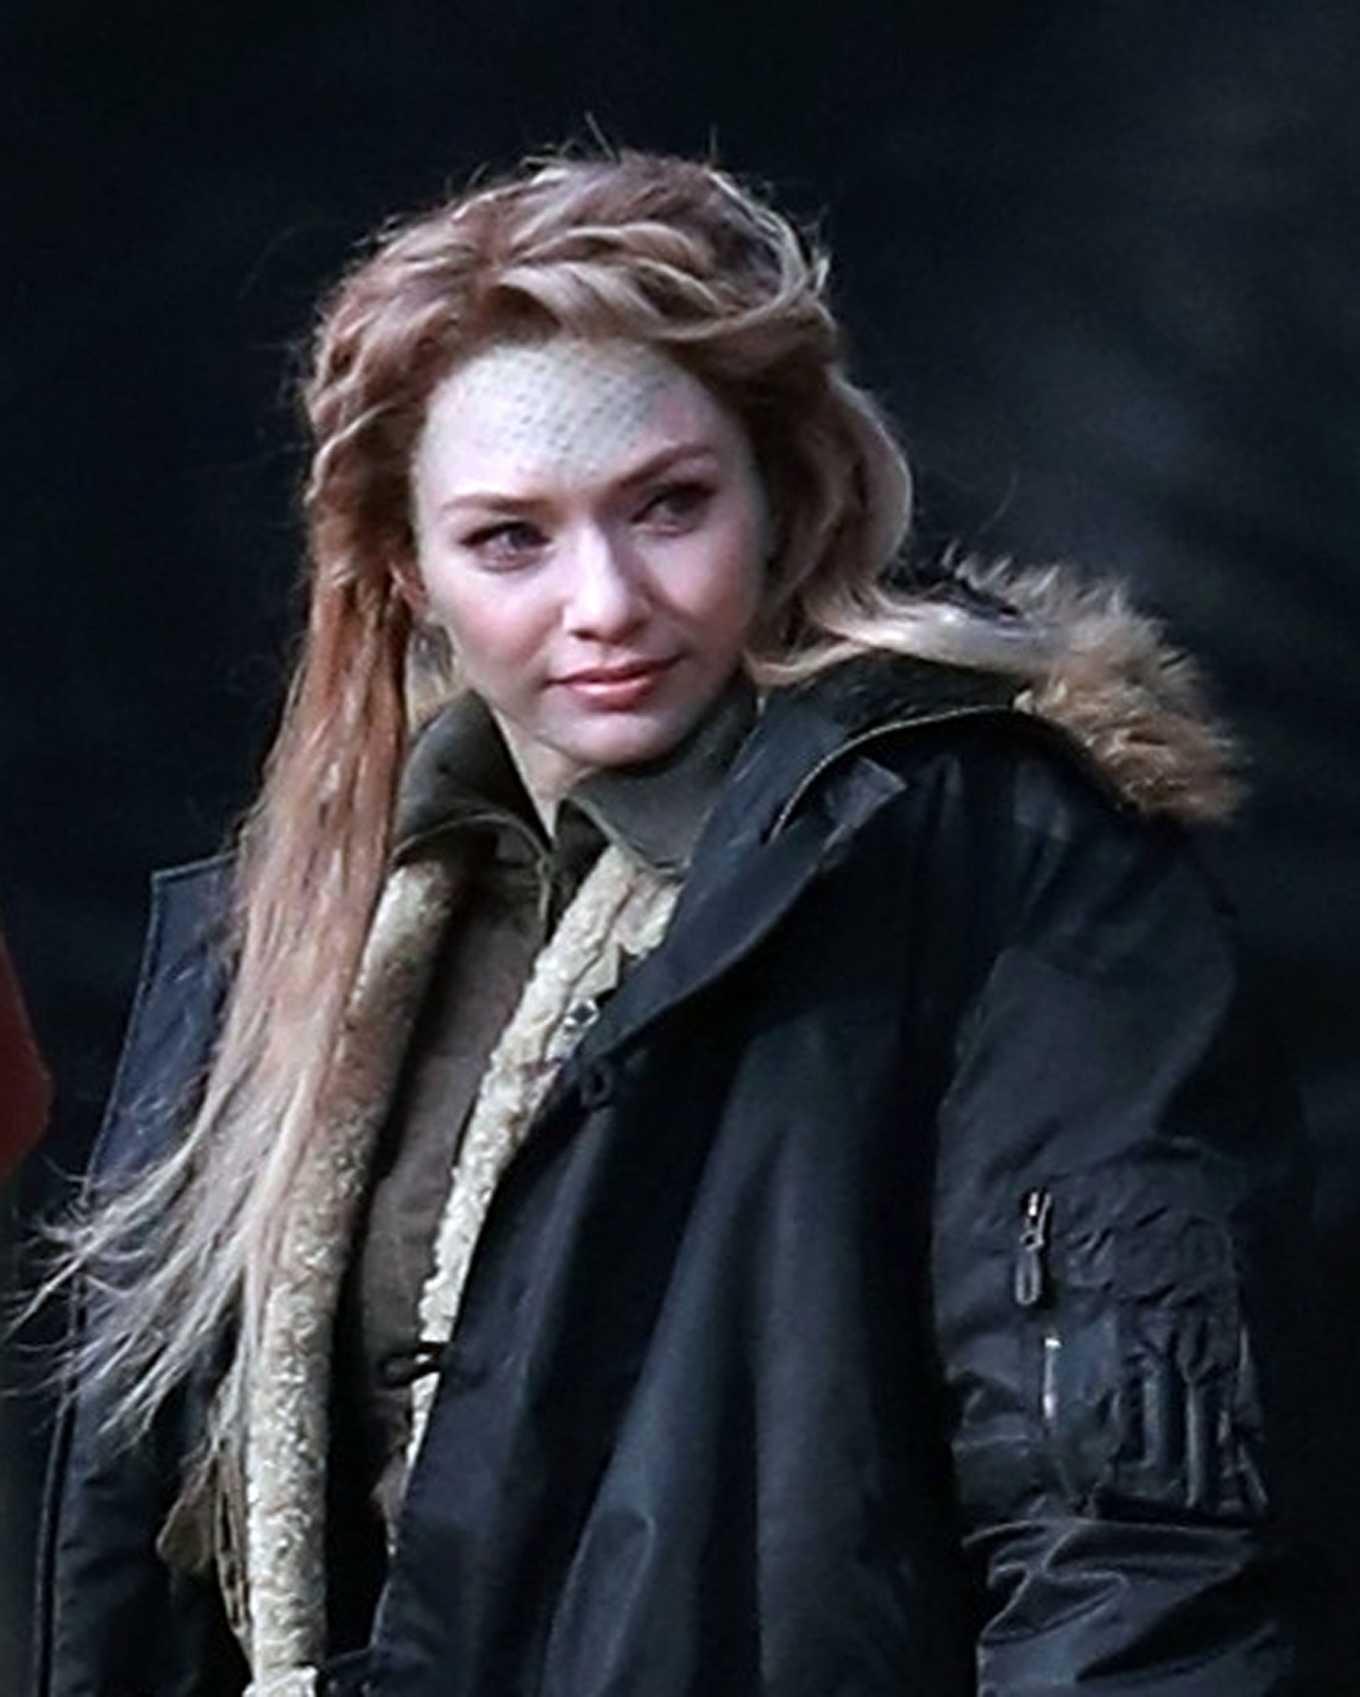 Eleanor Tomlinson 2020 : Eleanor Tomlinson – Filming scenes for the upcoming Sky Drama Intergalactic in Cheshire-08